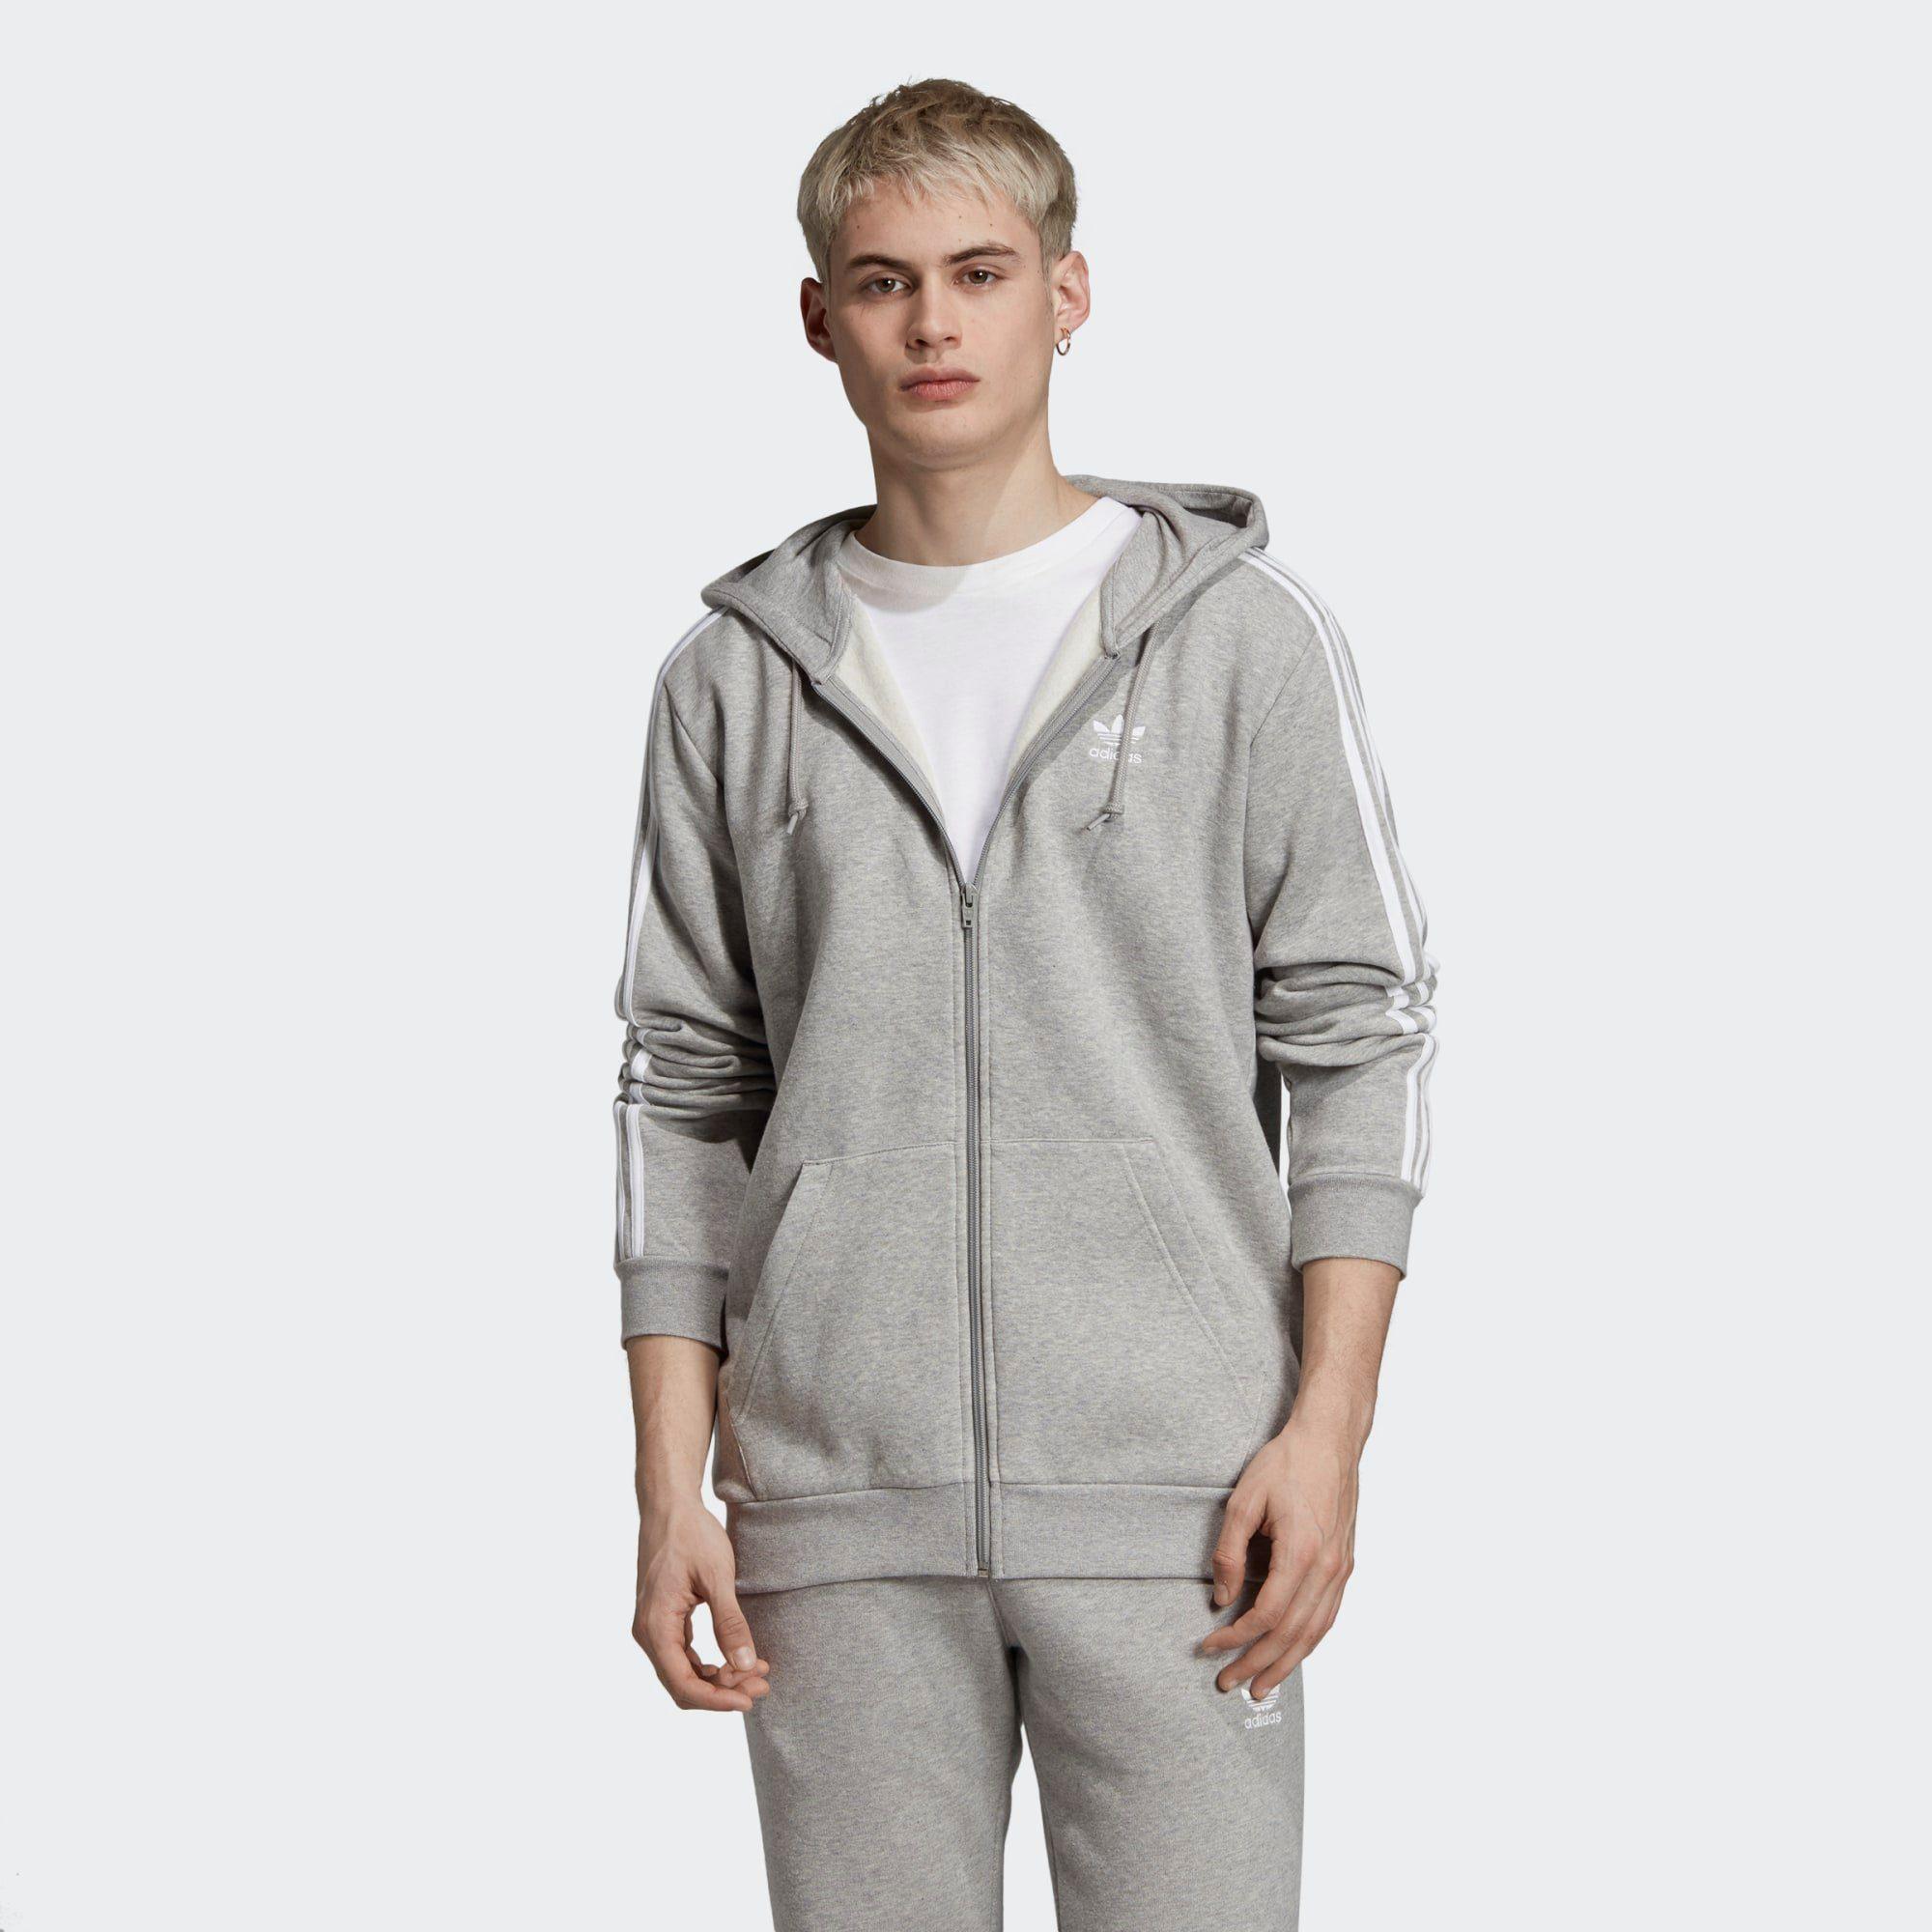 adidas 3 Streifen Kapuzenjacke Damen billig kaufen